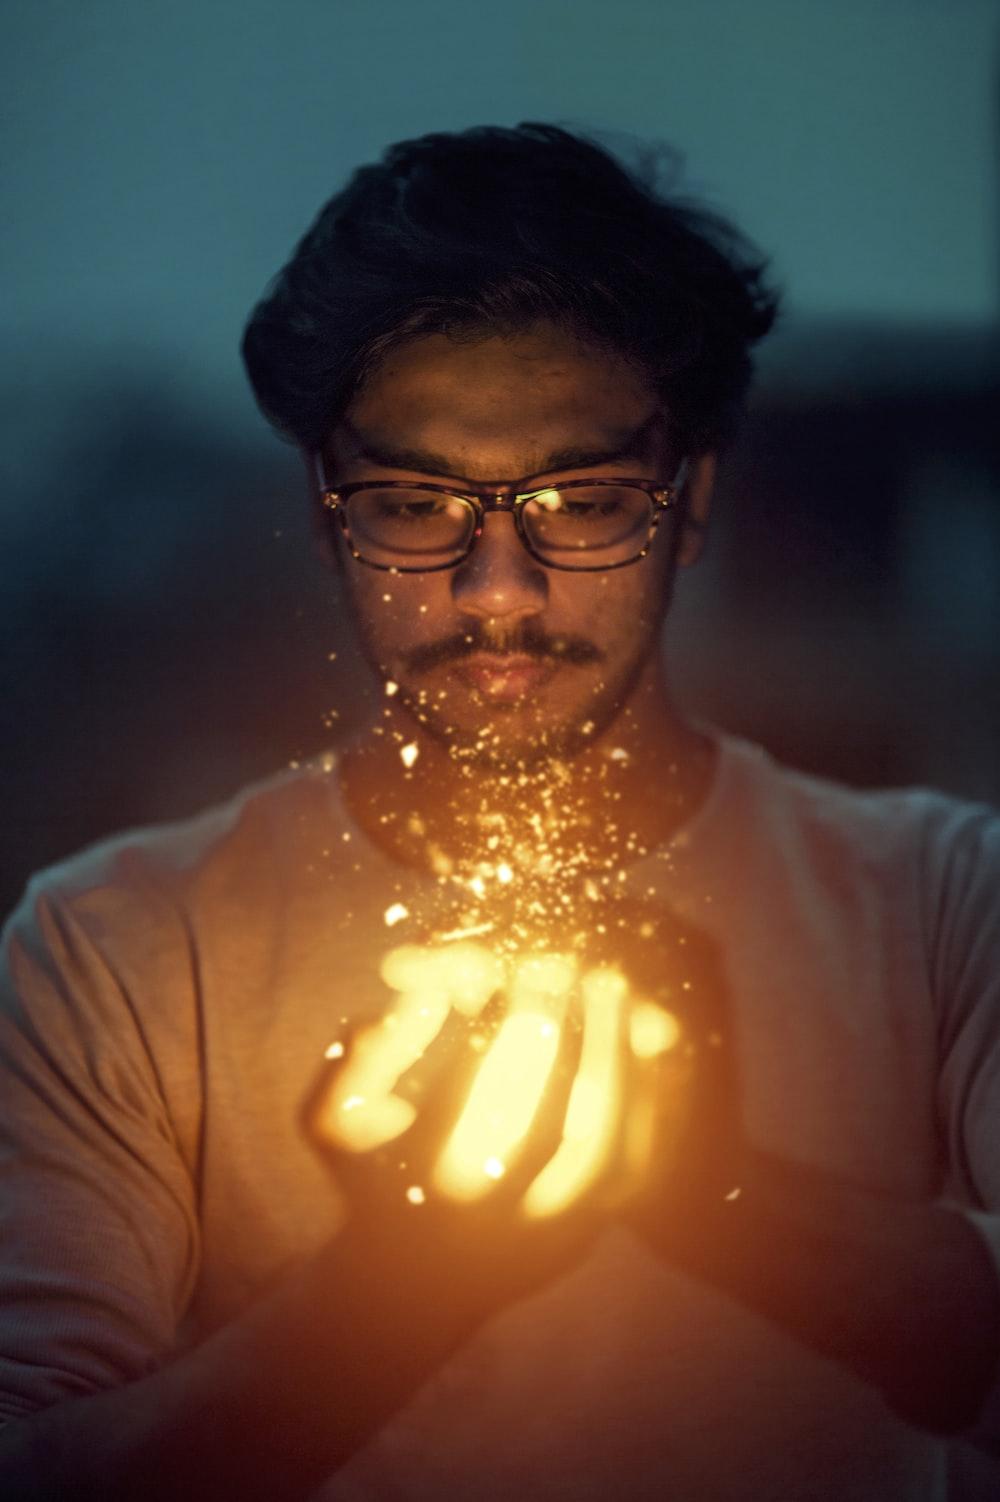 man holding lighted art